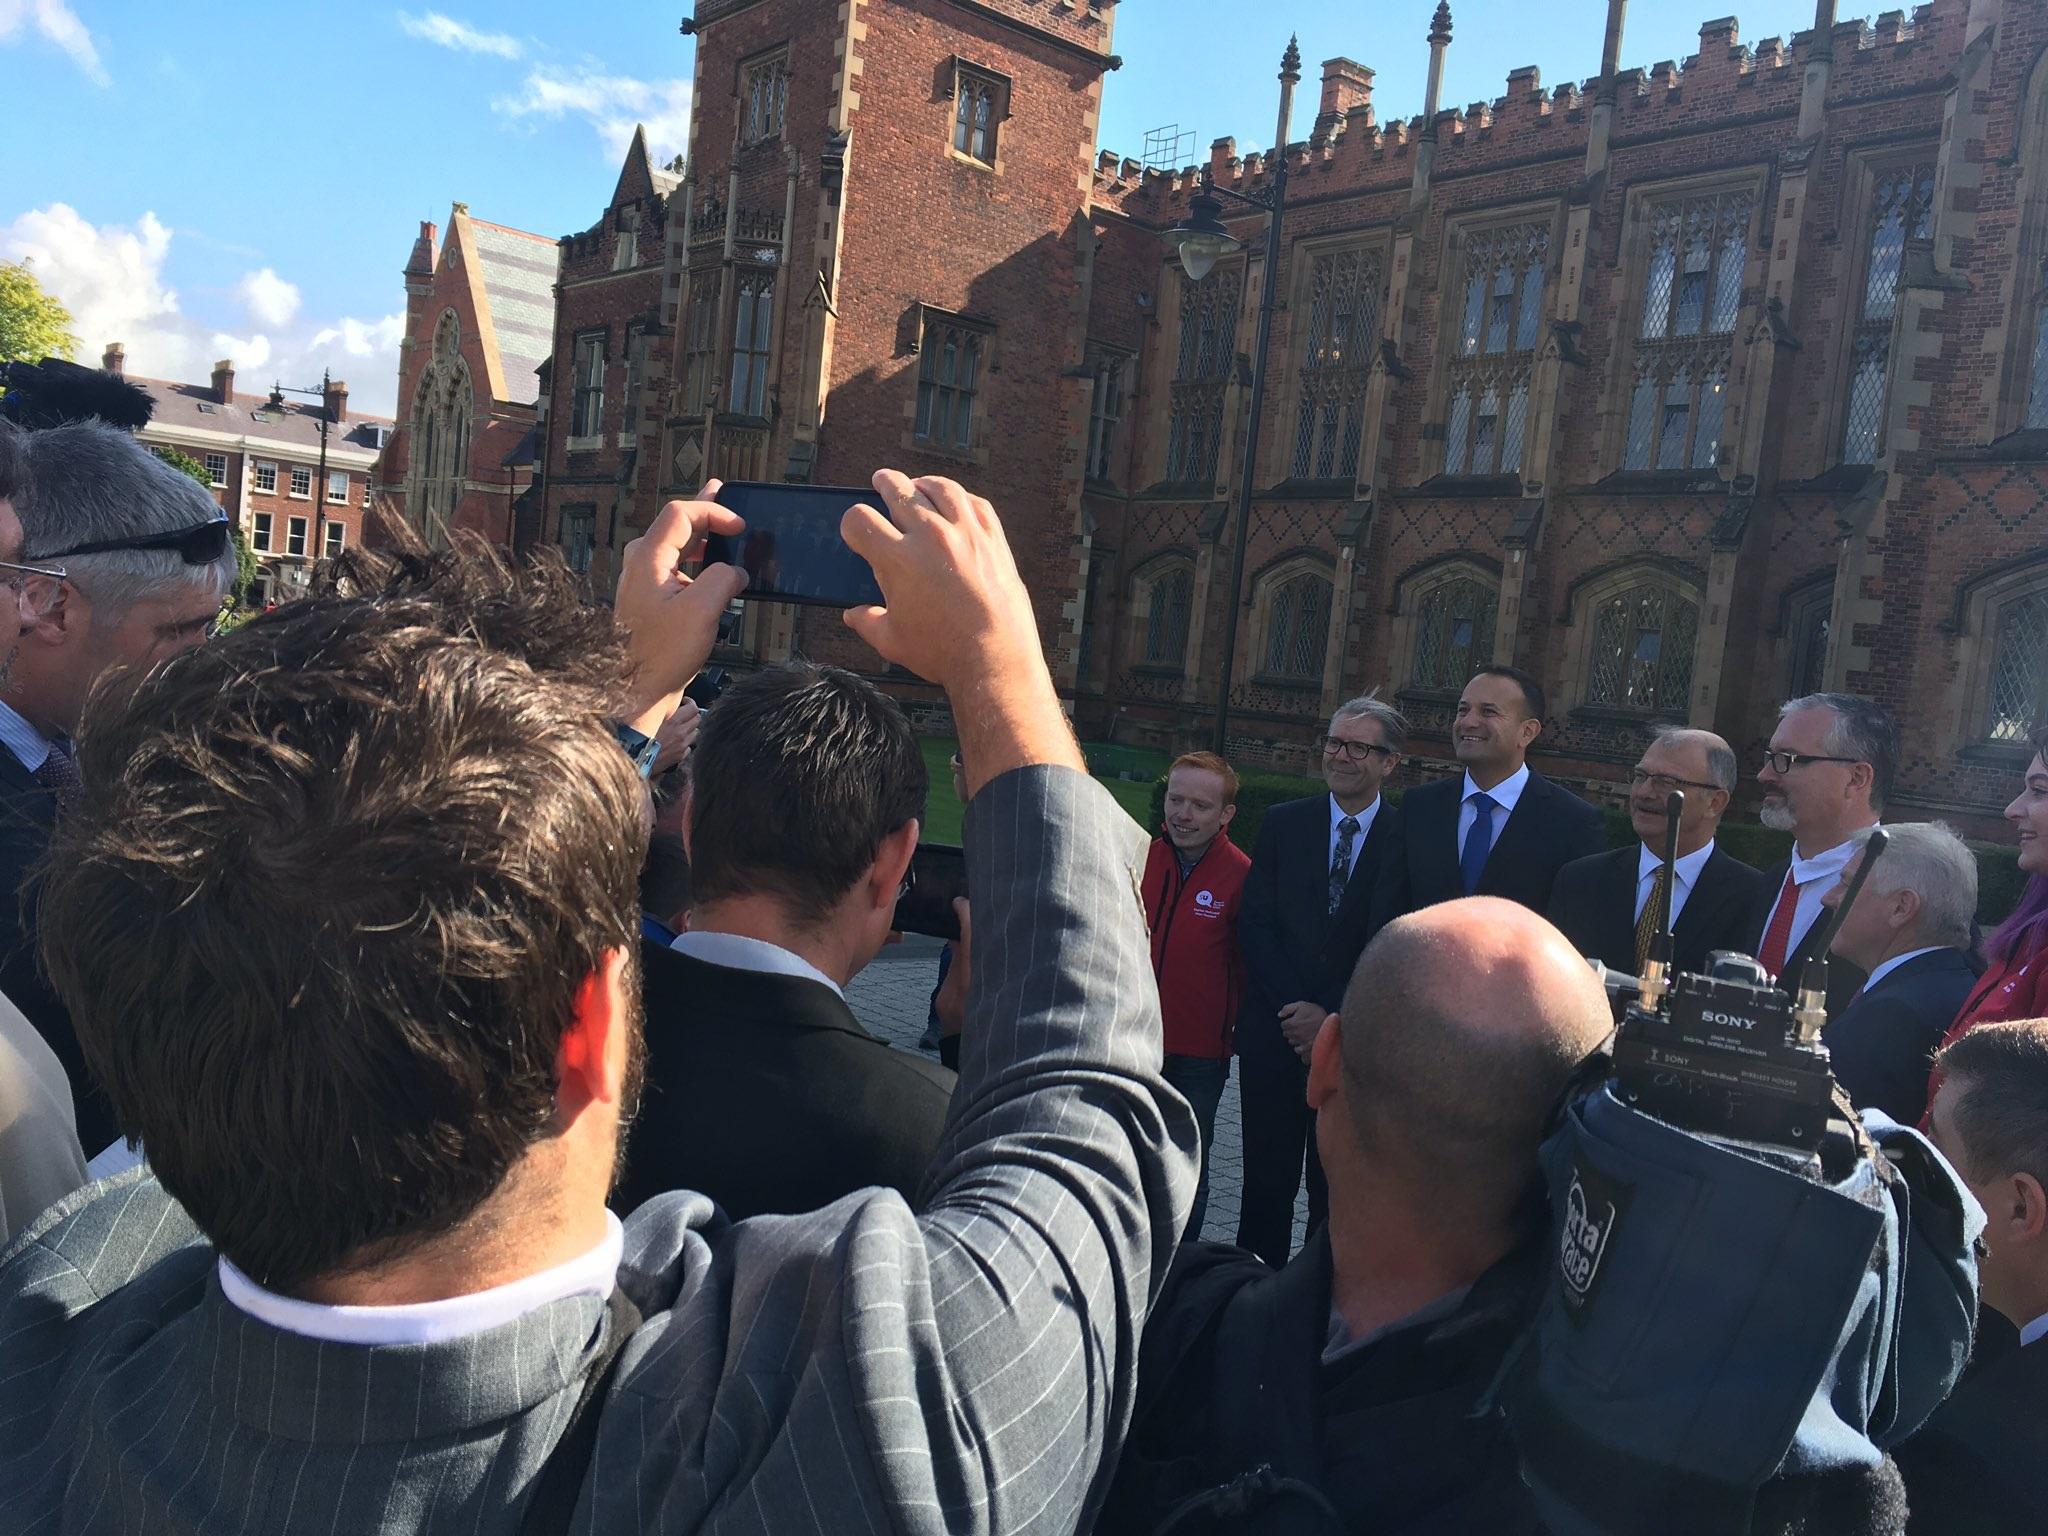 Republic of Ireland PM Leo Varadkar (2nd right) at Queen's University in Belfast.